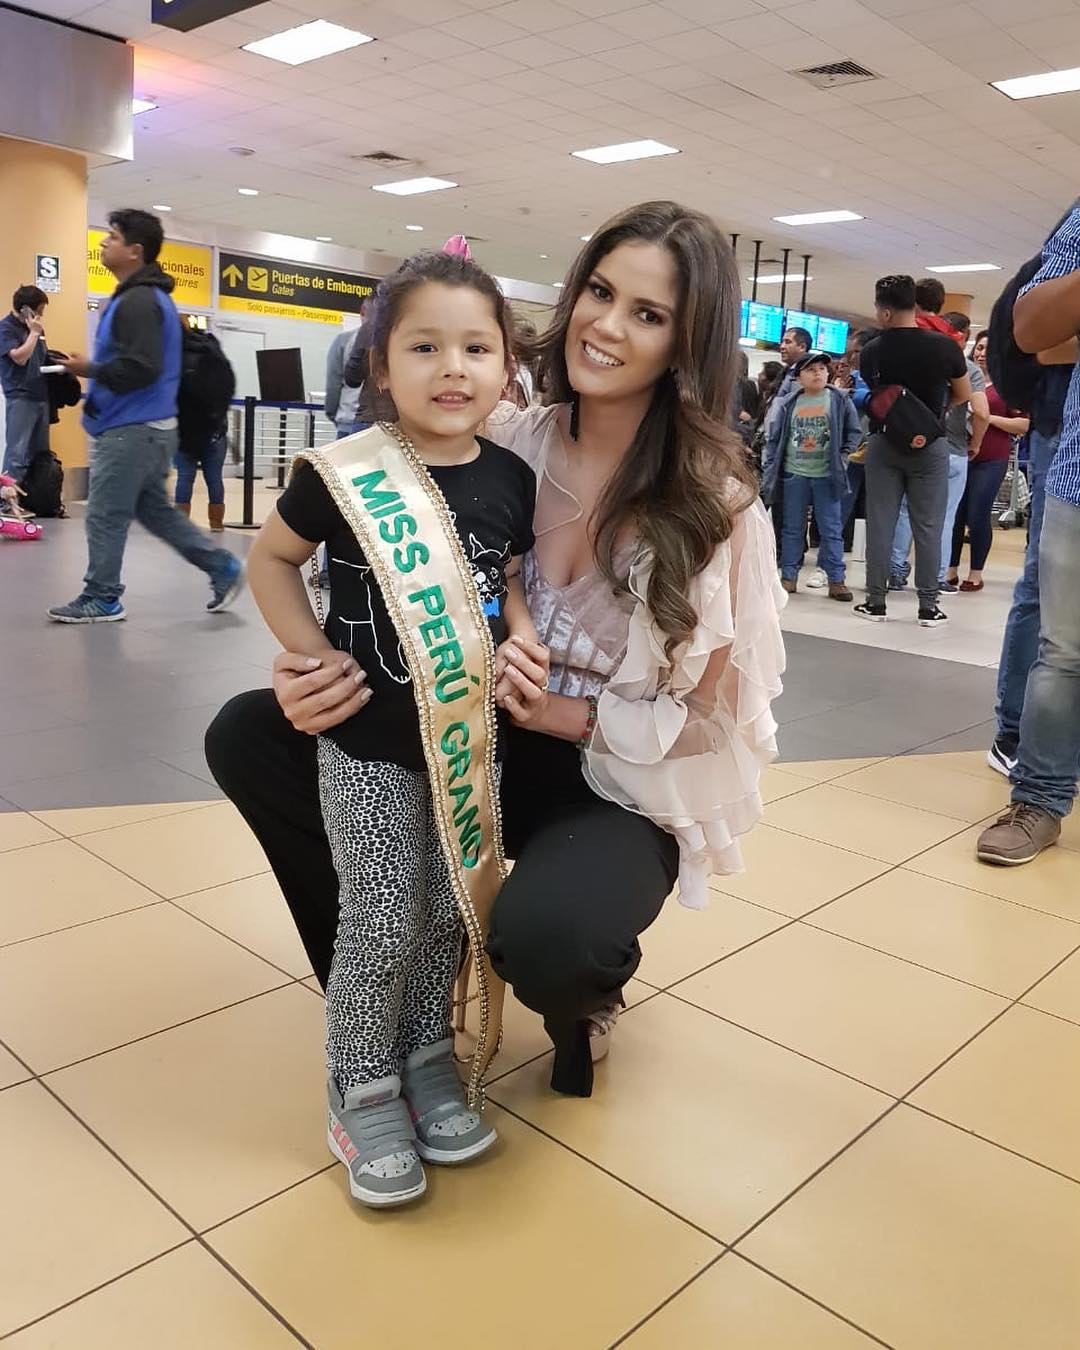 andrea moberg, top 20 de miss grand international 2018 (best national costume). - Página 3 42640610